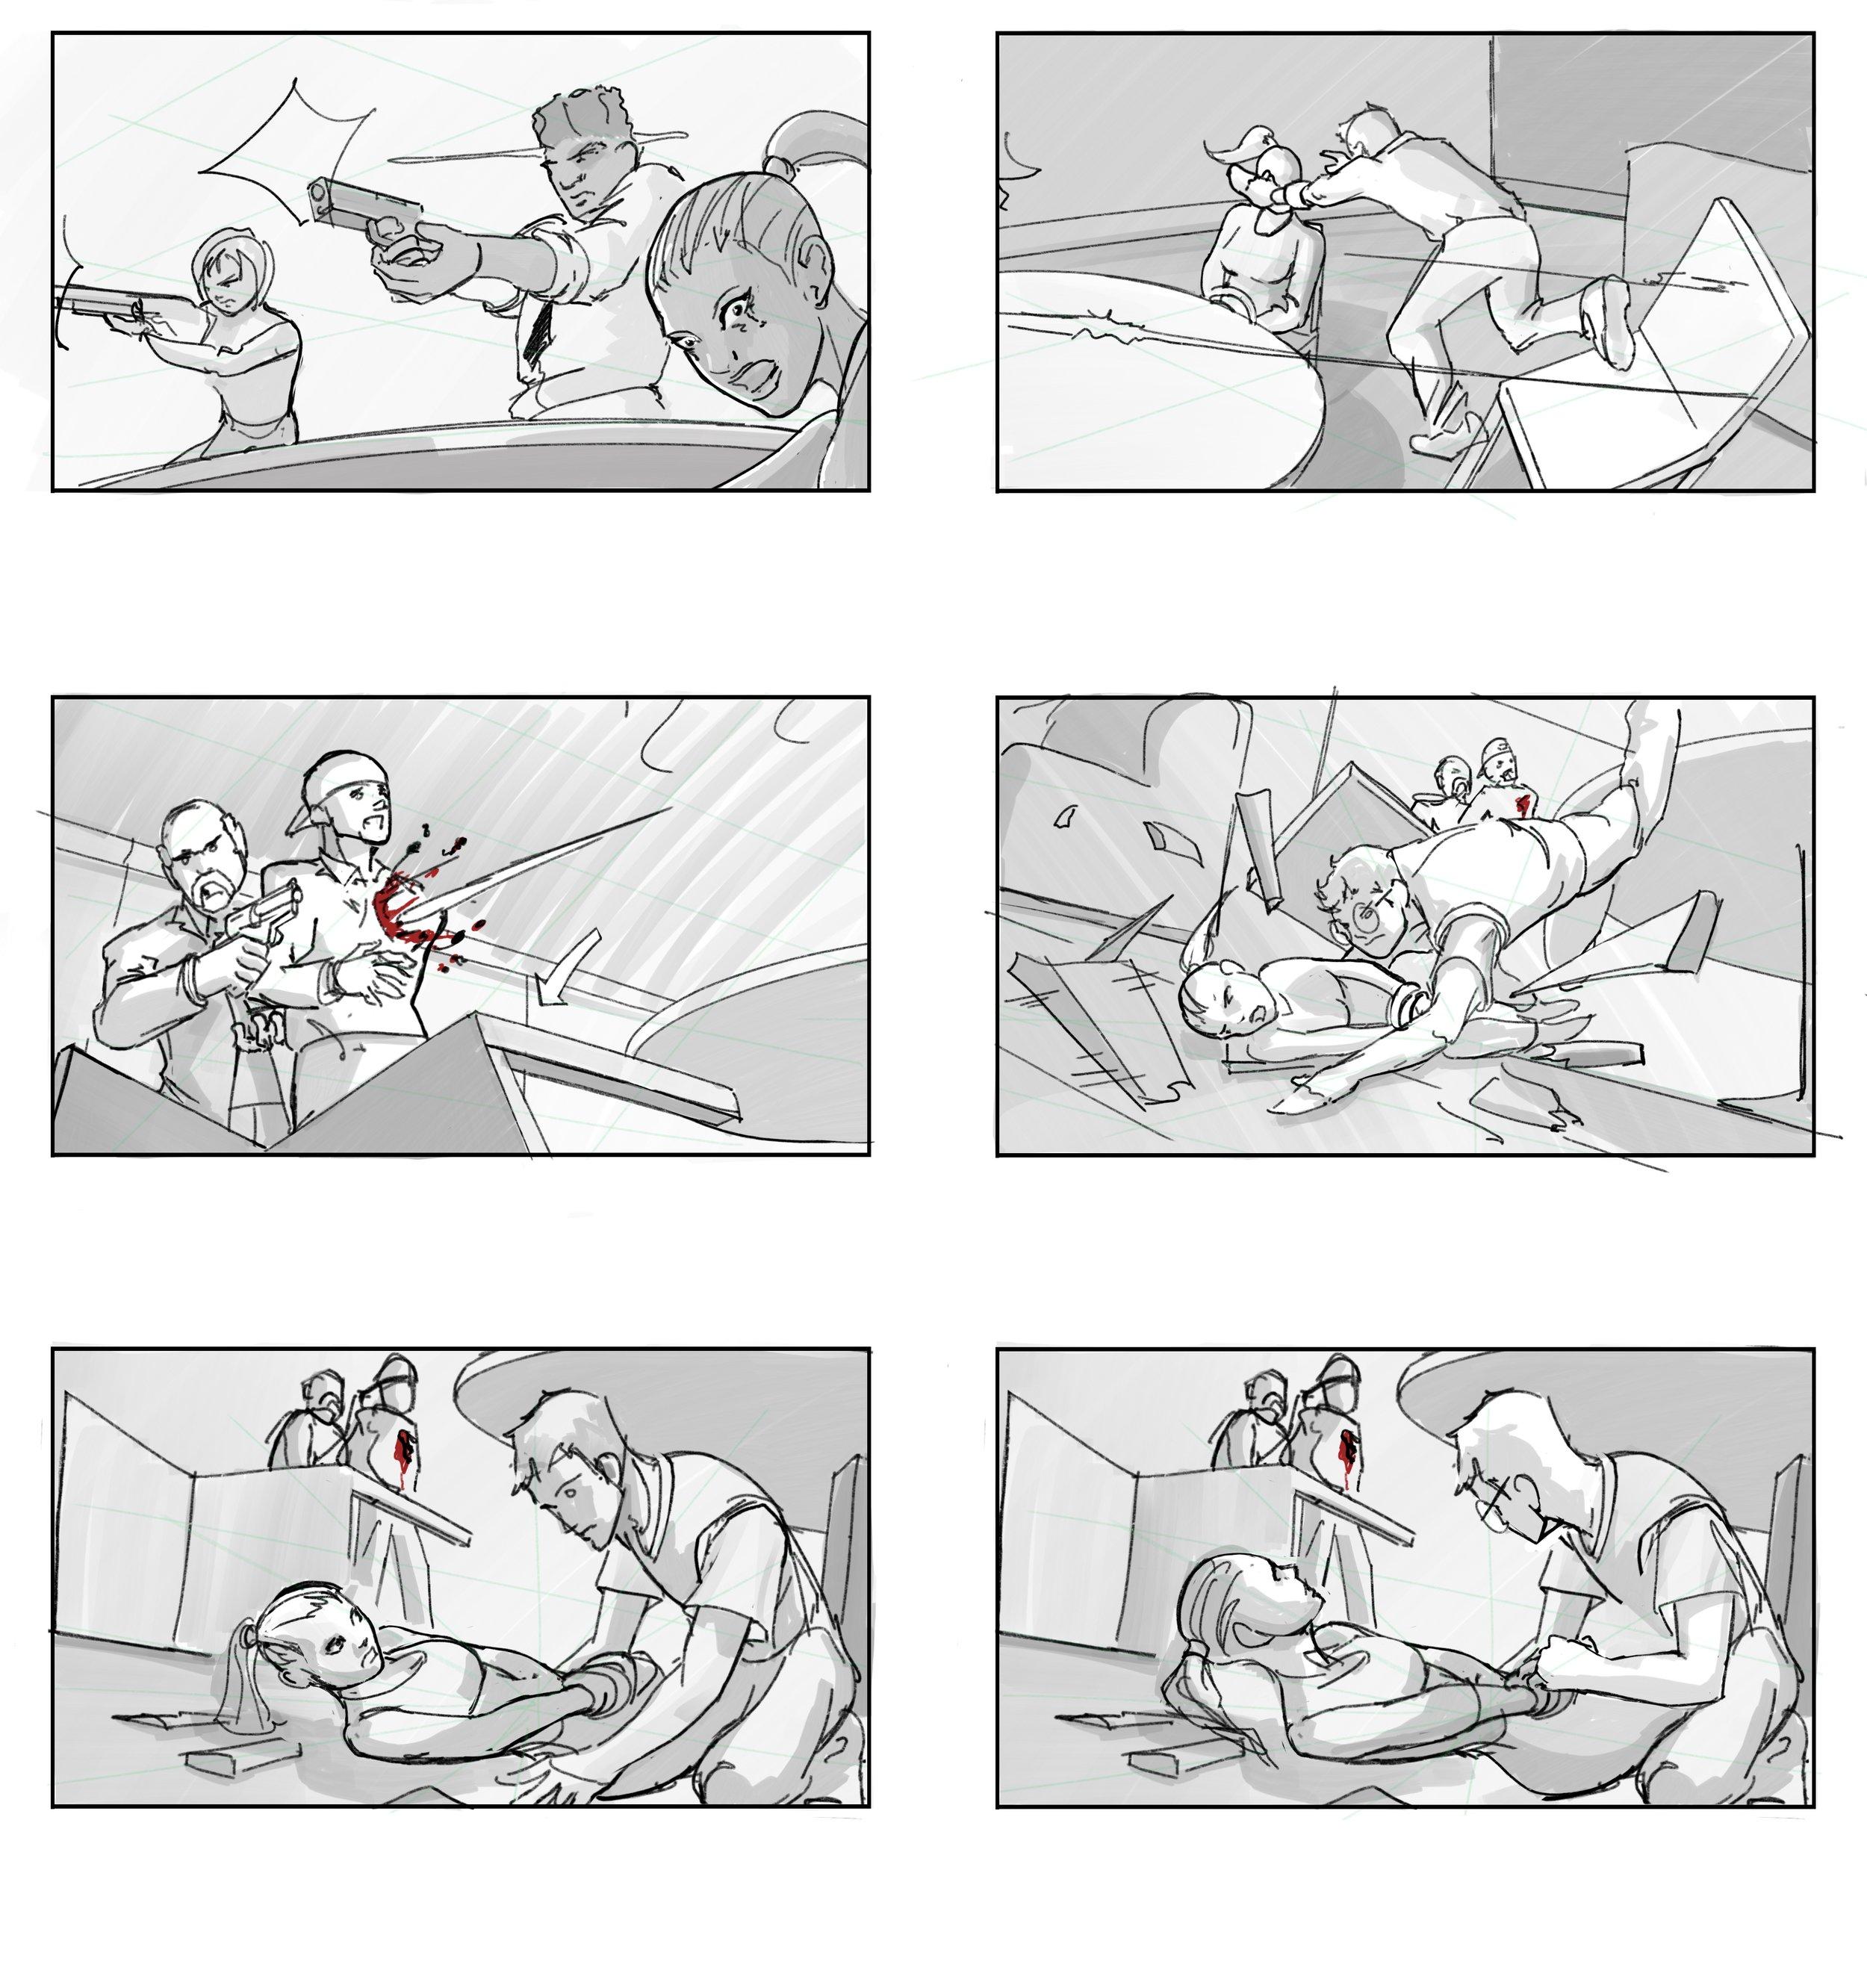 SAM_BS_Catapano_Storyboards_011.JPG